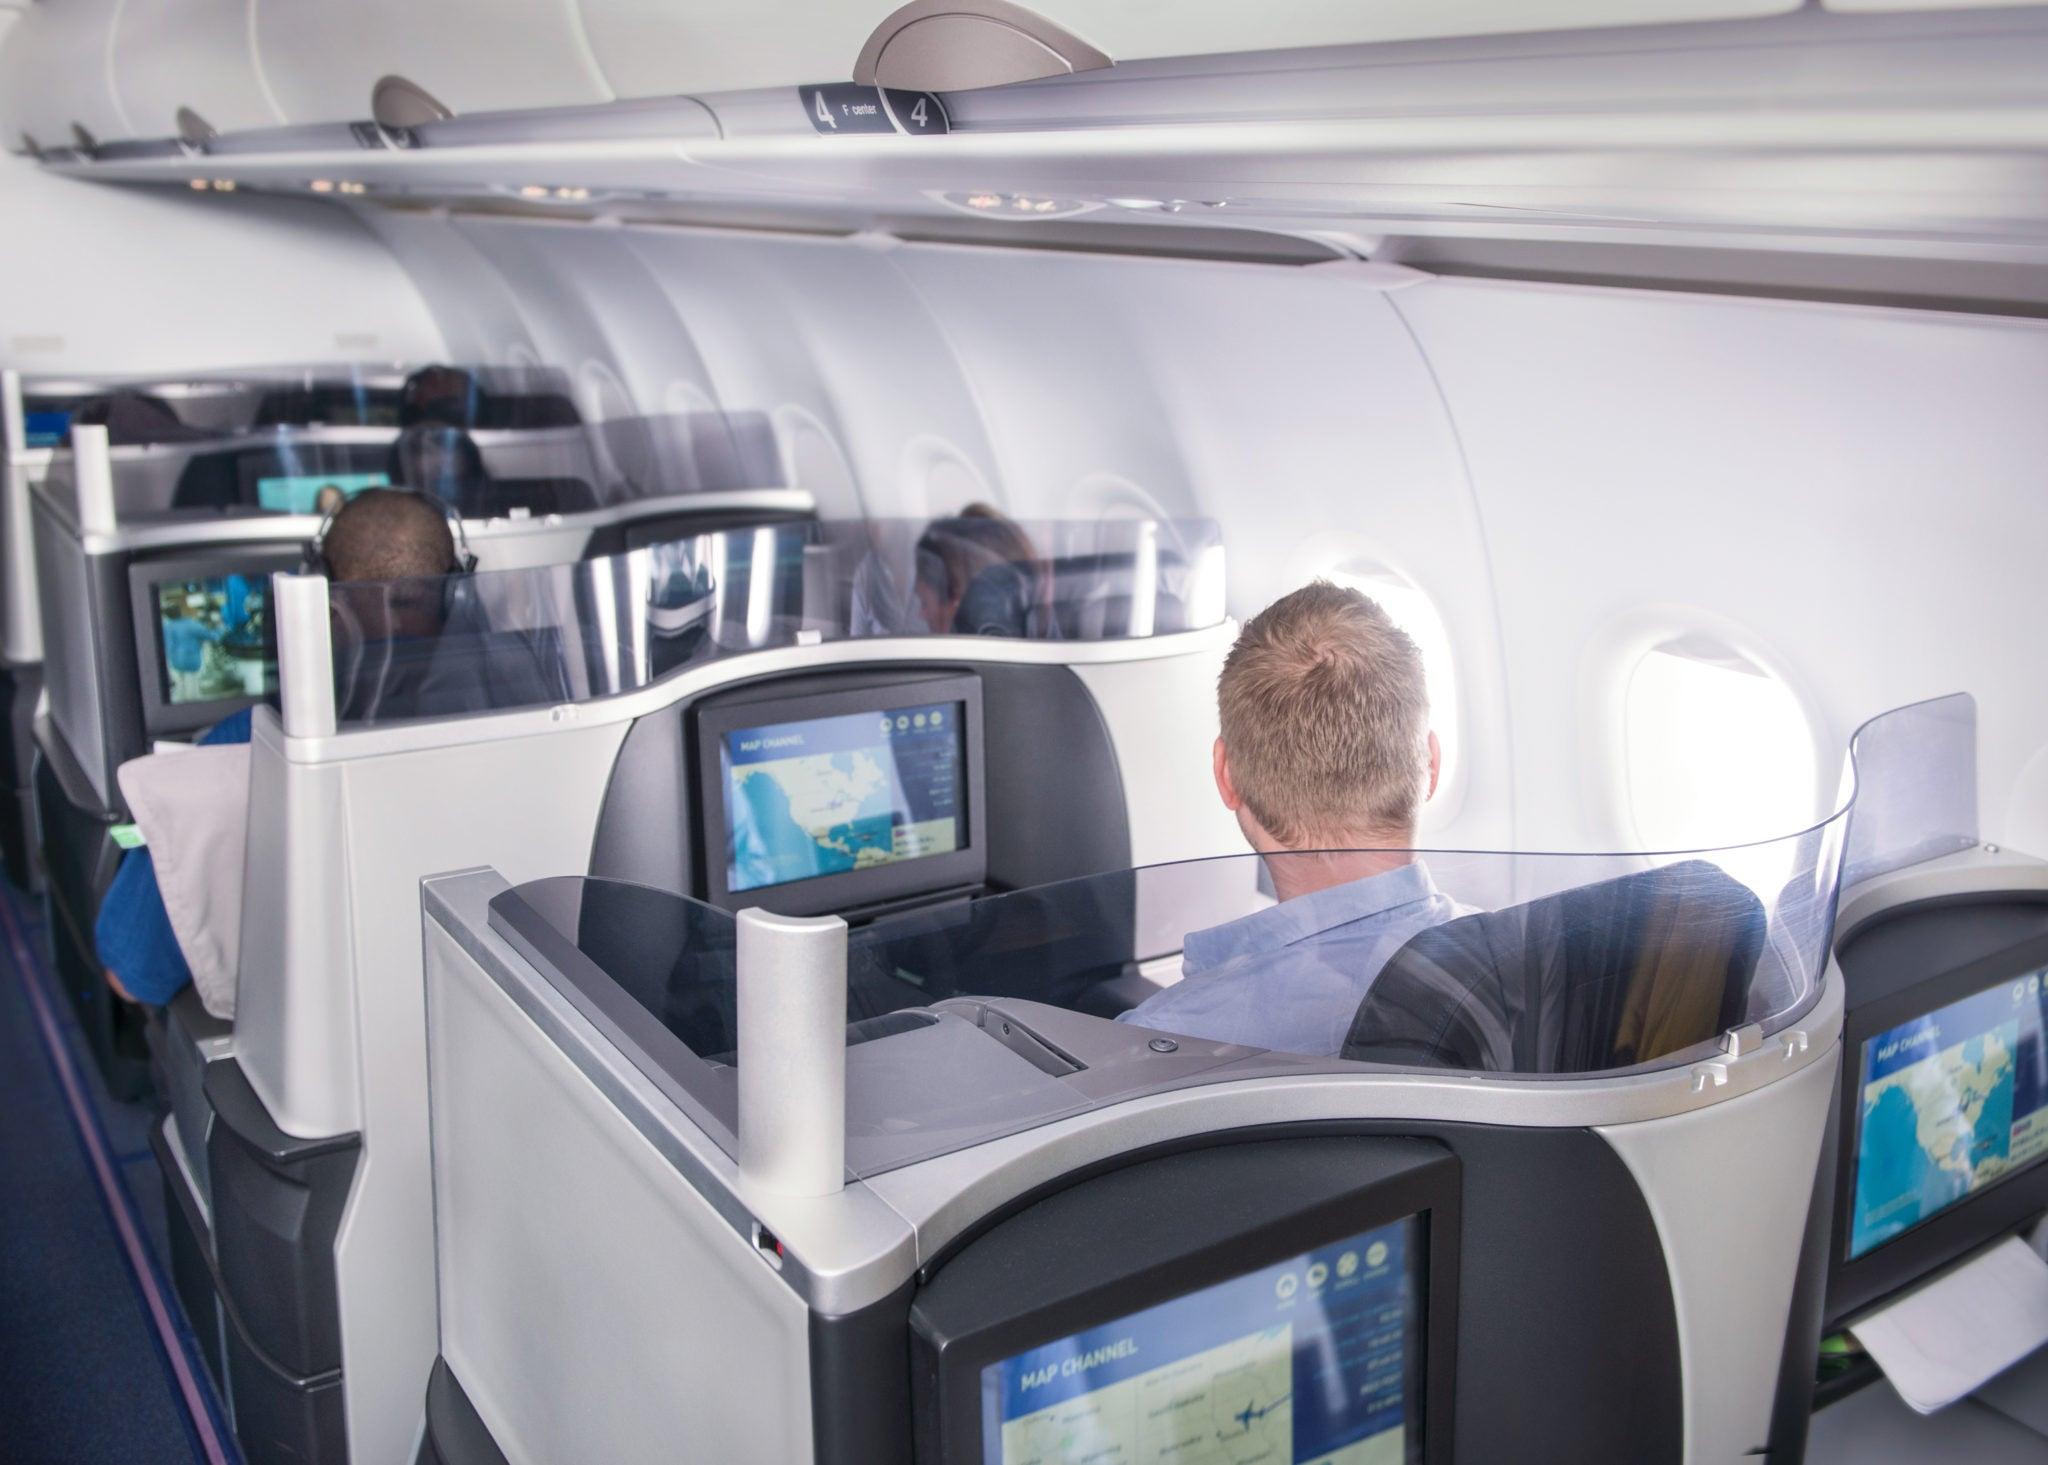 933e7340fbc6 7 Valuable Benefits of the Barclaycard JetBlue Plus Card  2018